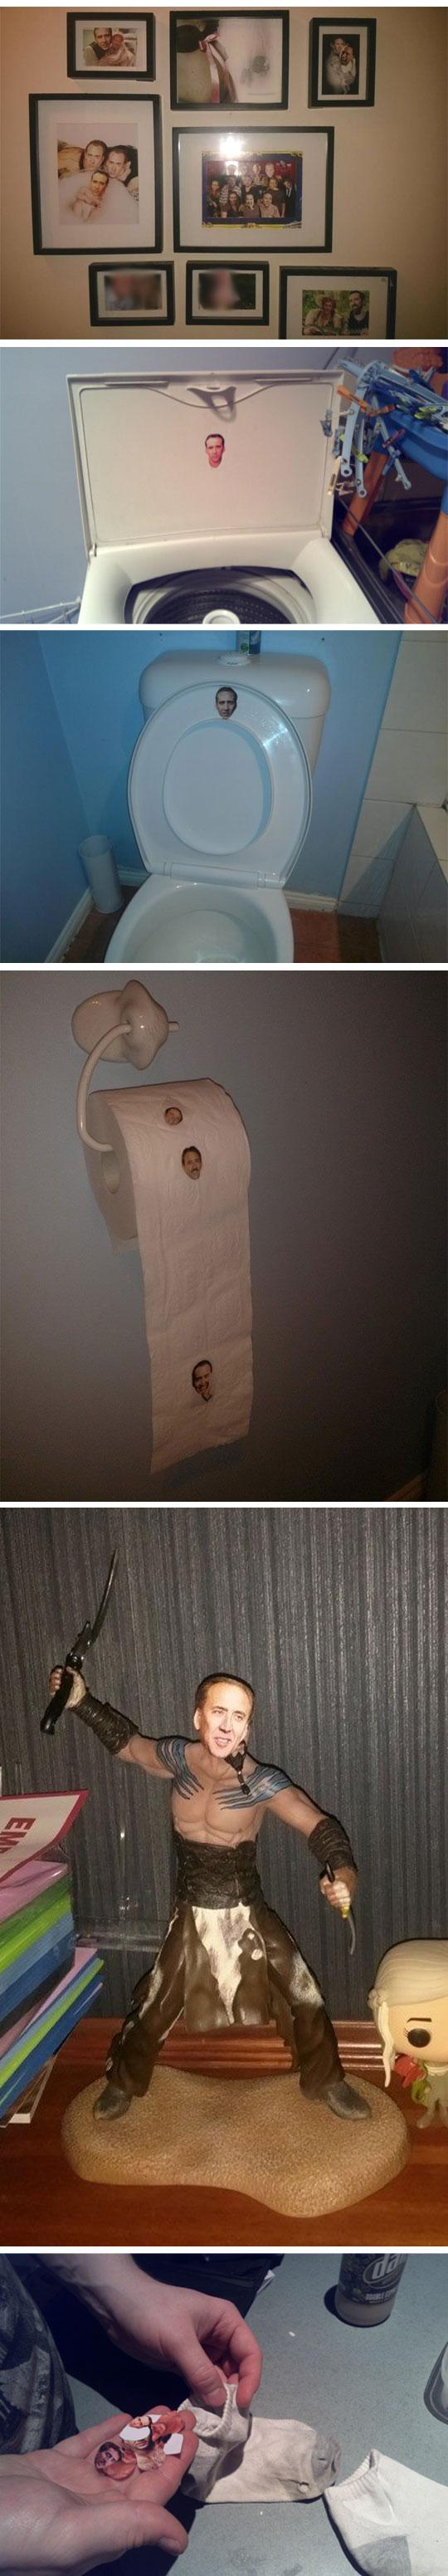 funny-Nicolas-Cage-prank-house-faces